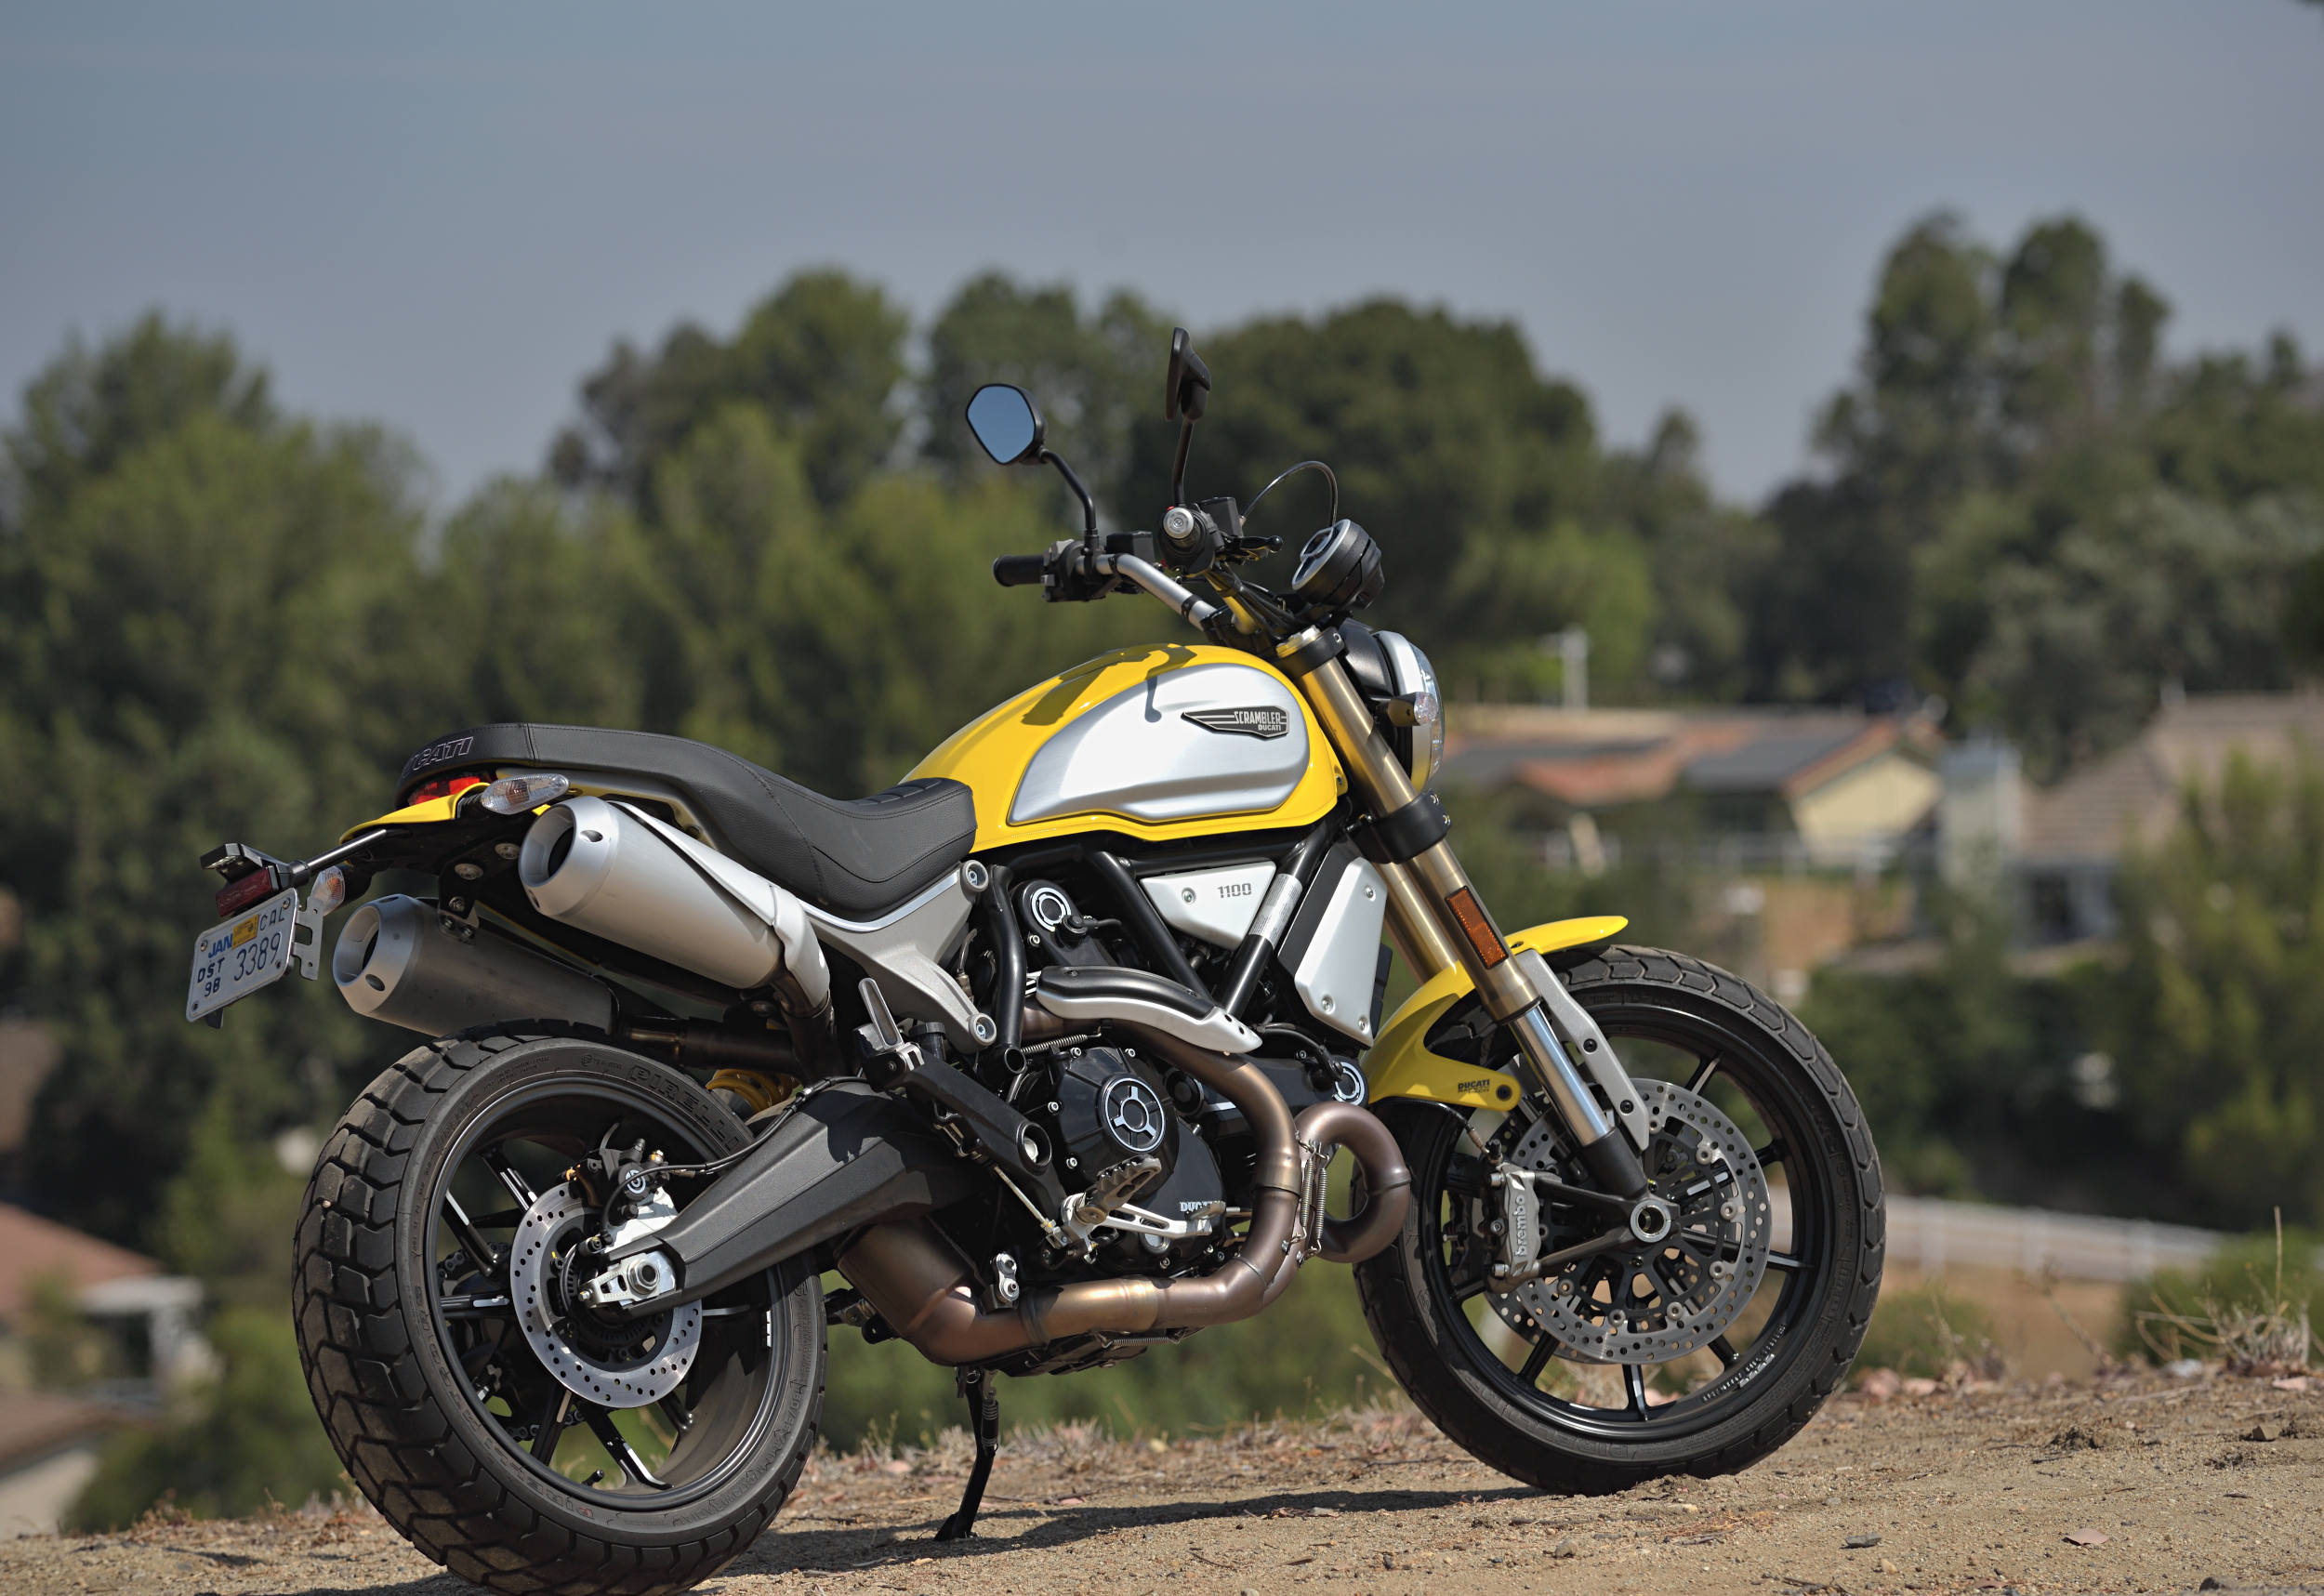 2018 Ducati Scrambler 1100 Md Ride Review Motorcycledailycom